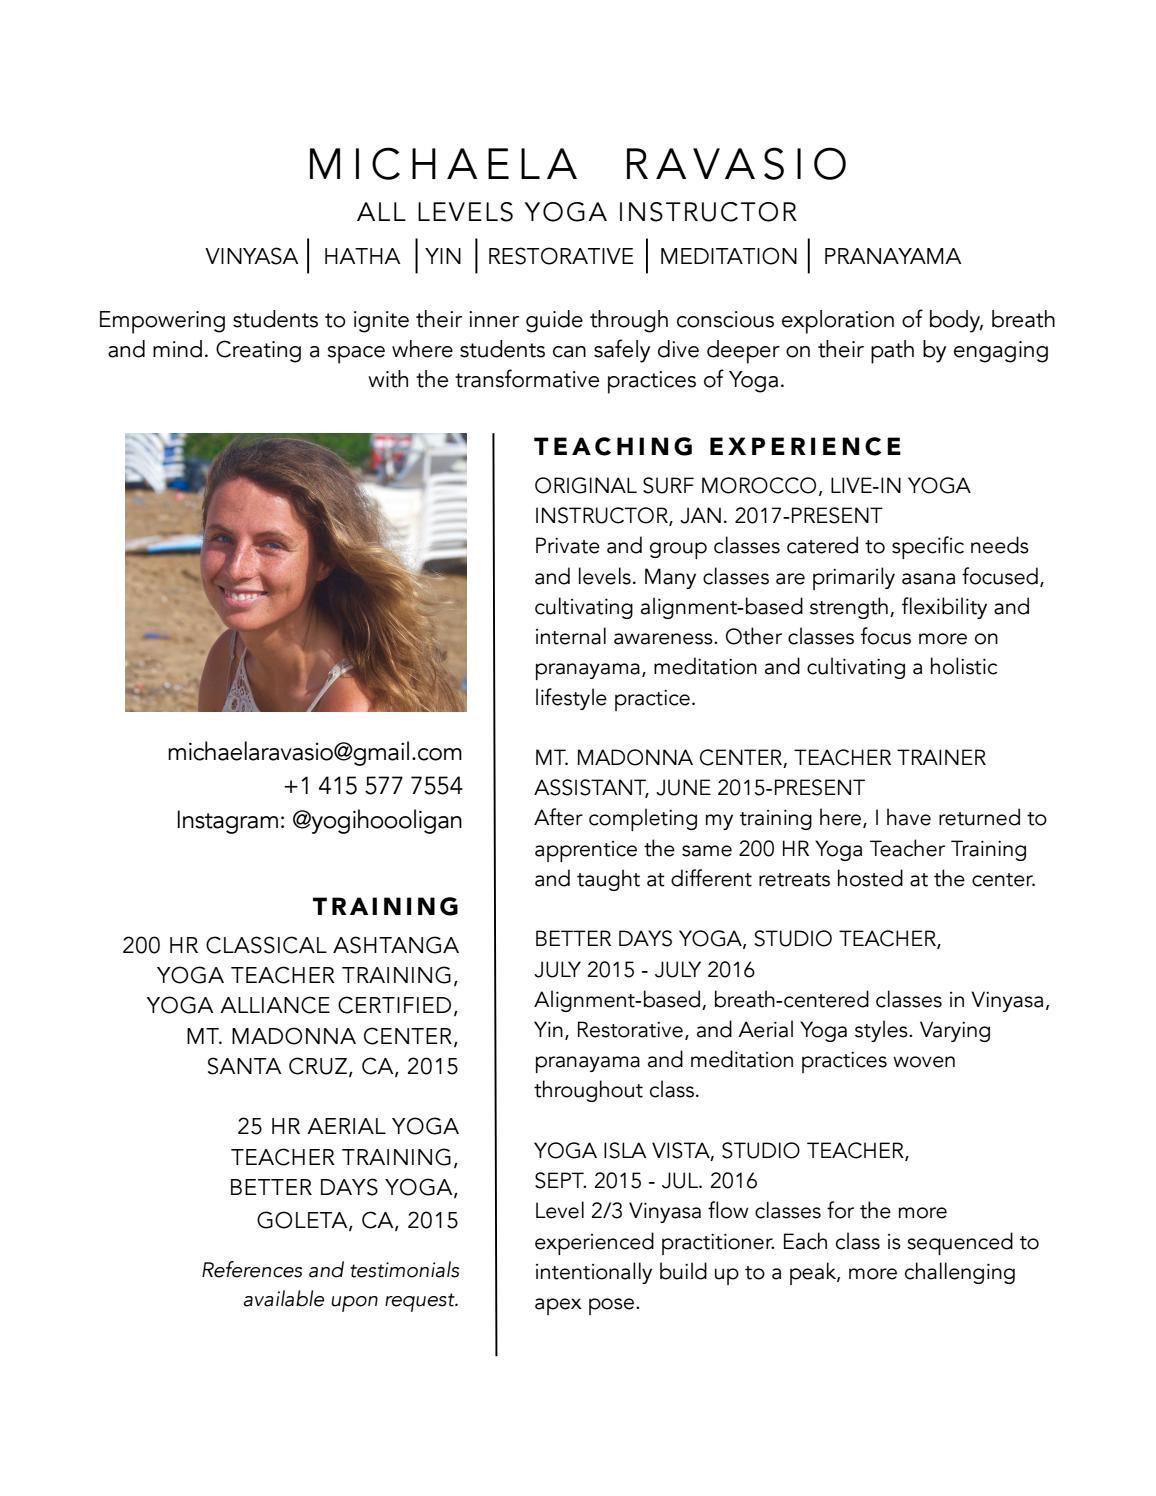 michaela ravasio yoga instructor resume by michaela